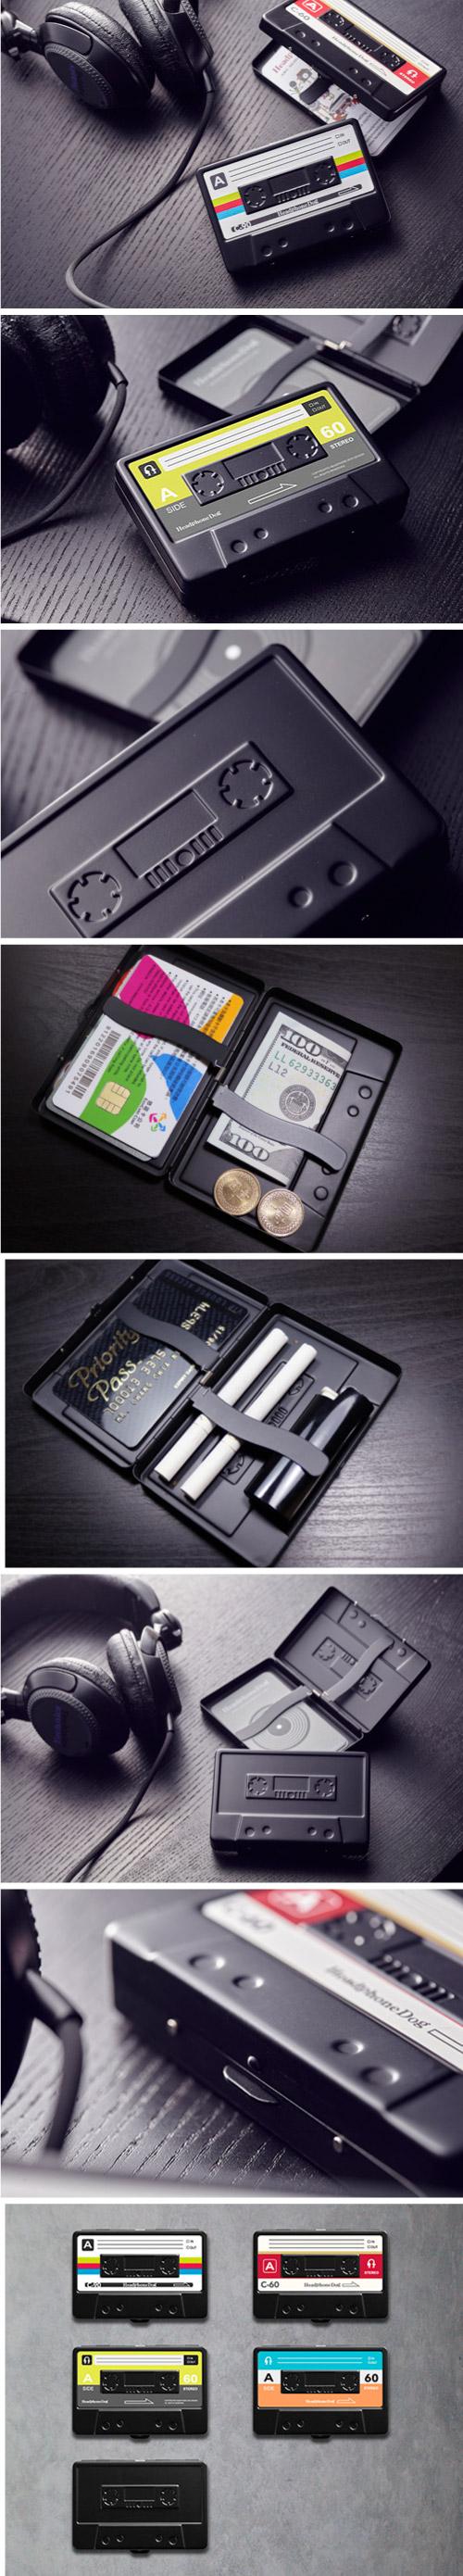 HeadphoneDog|金屬烤漆造型名片盒/煙盒